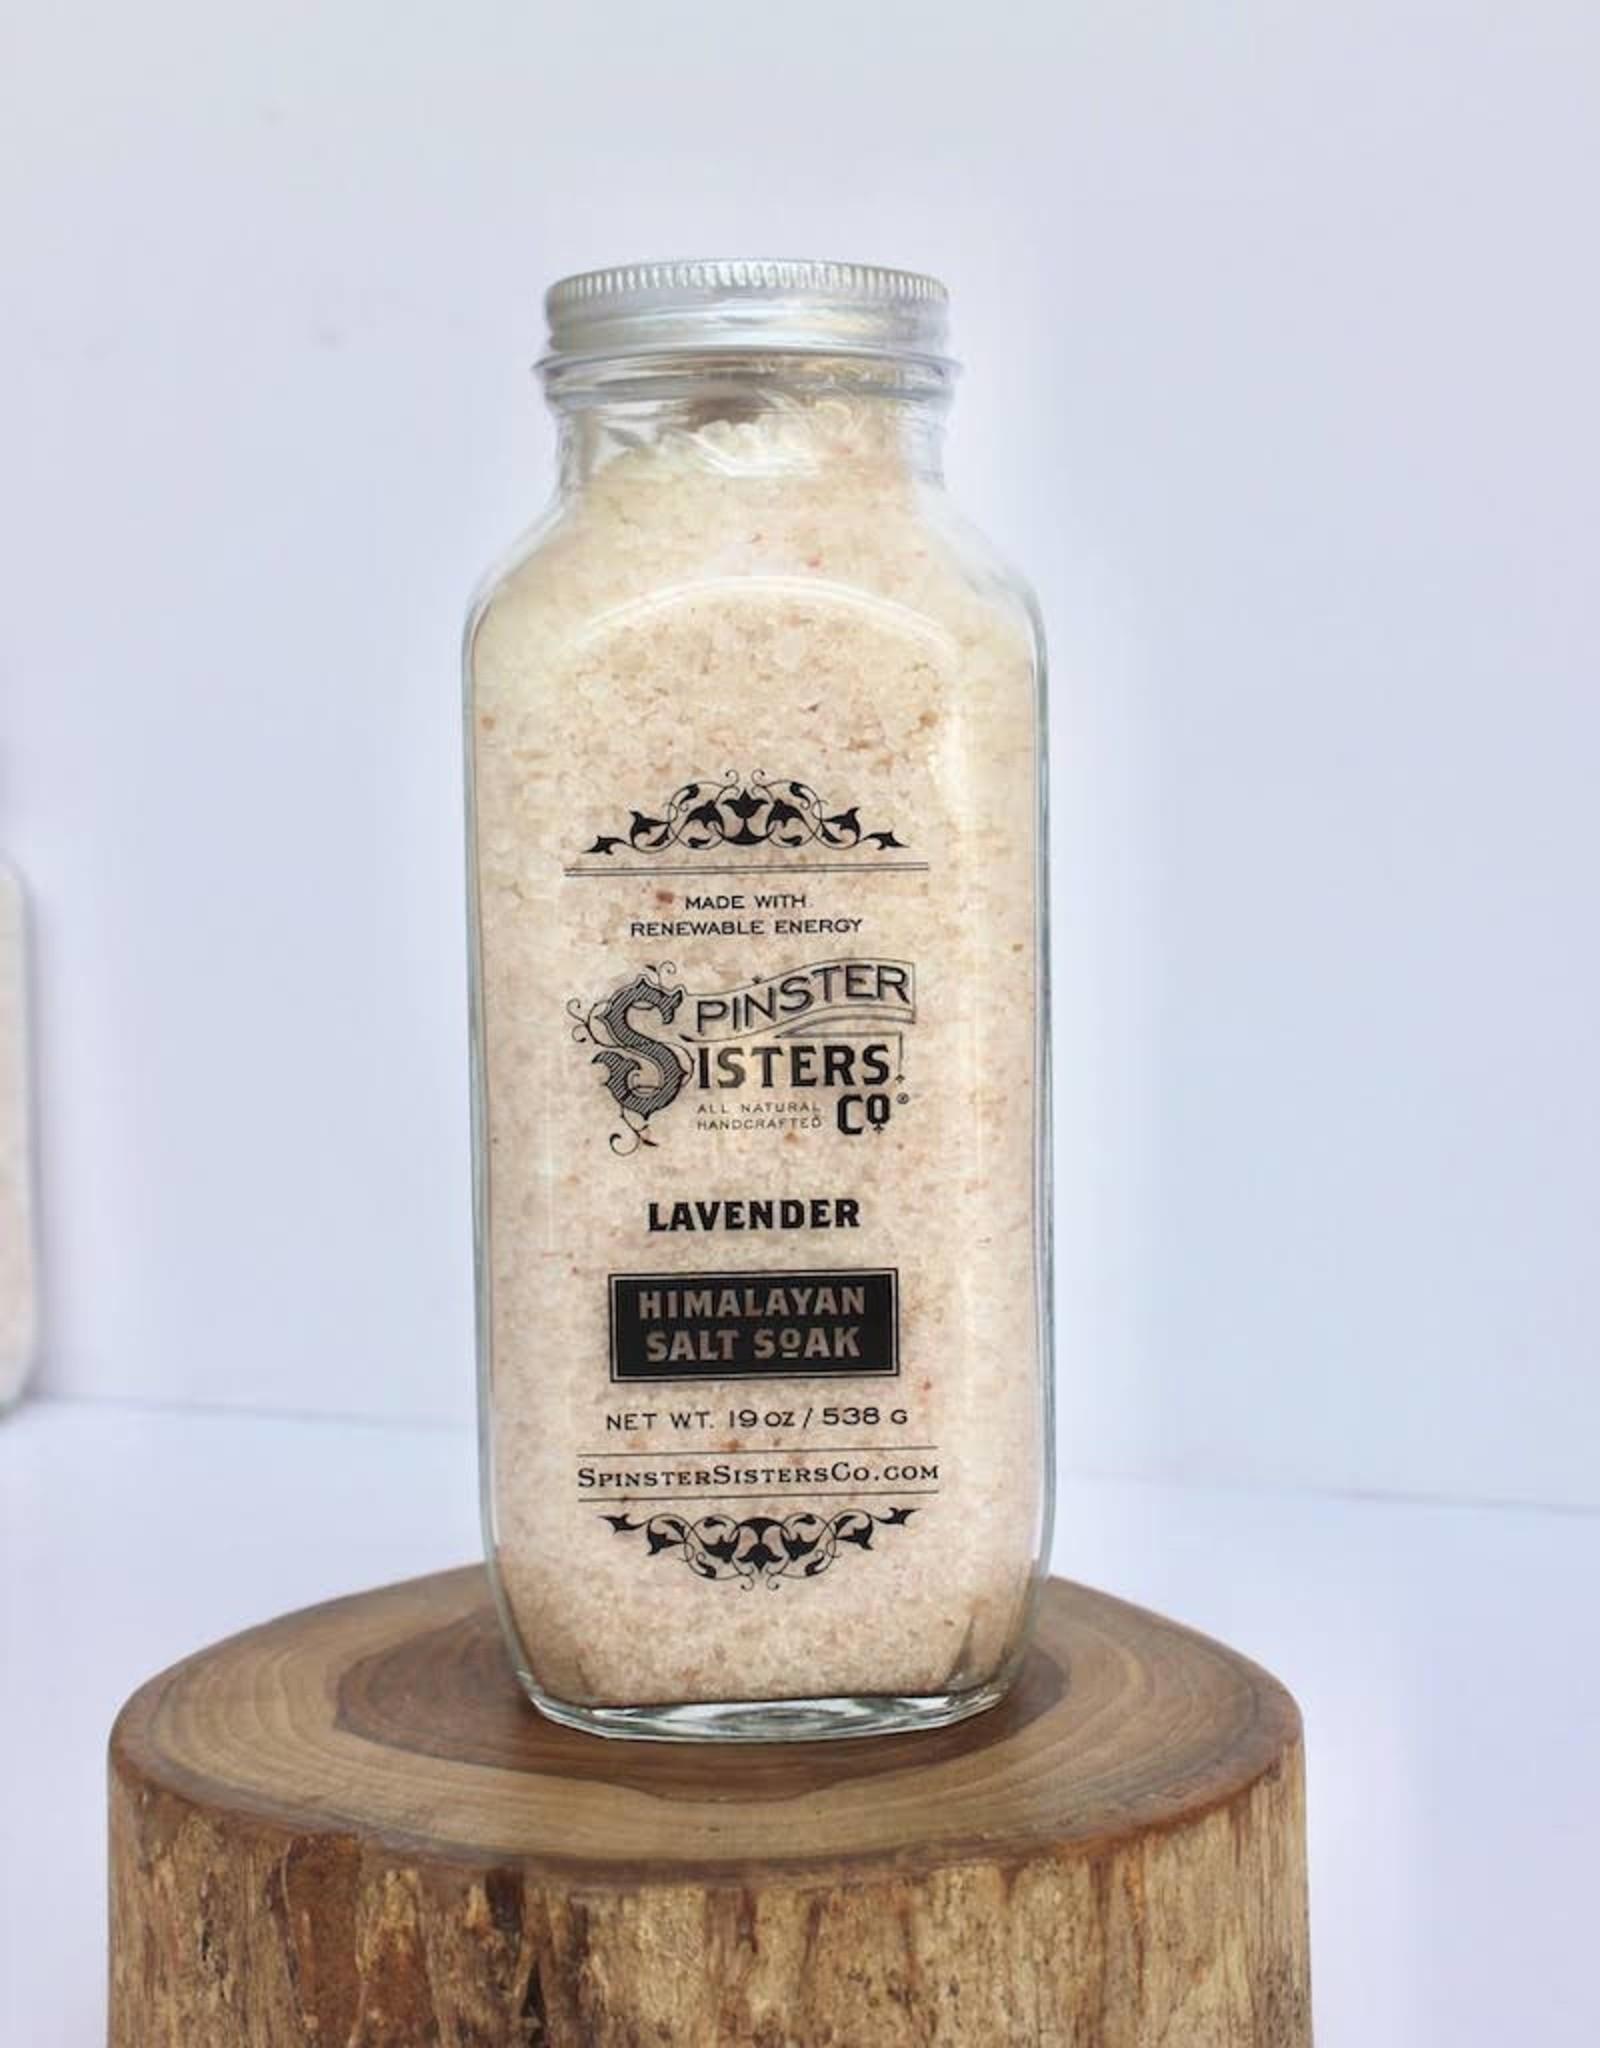 Spinster Sisters Himalayan Salt Soak